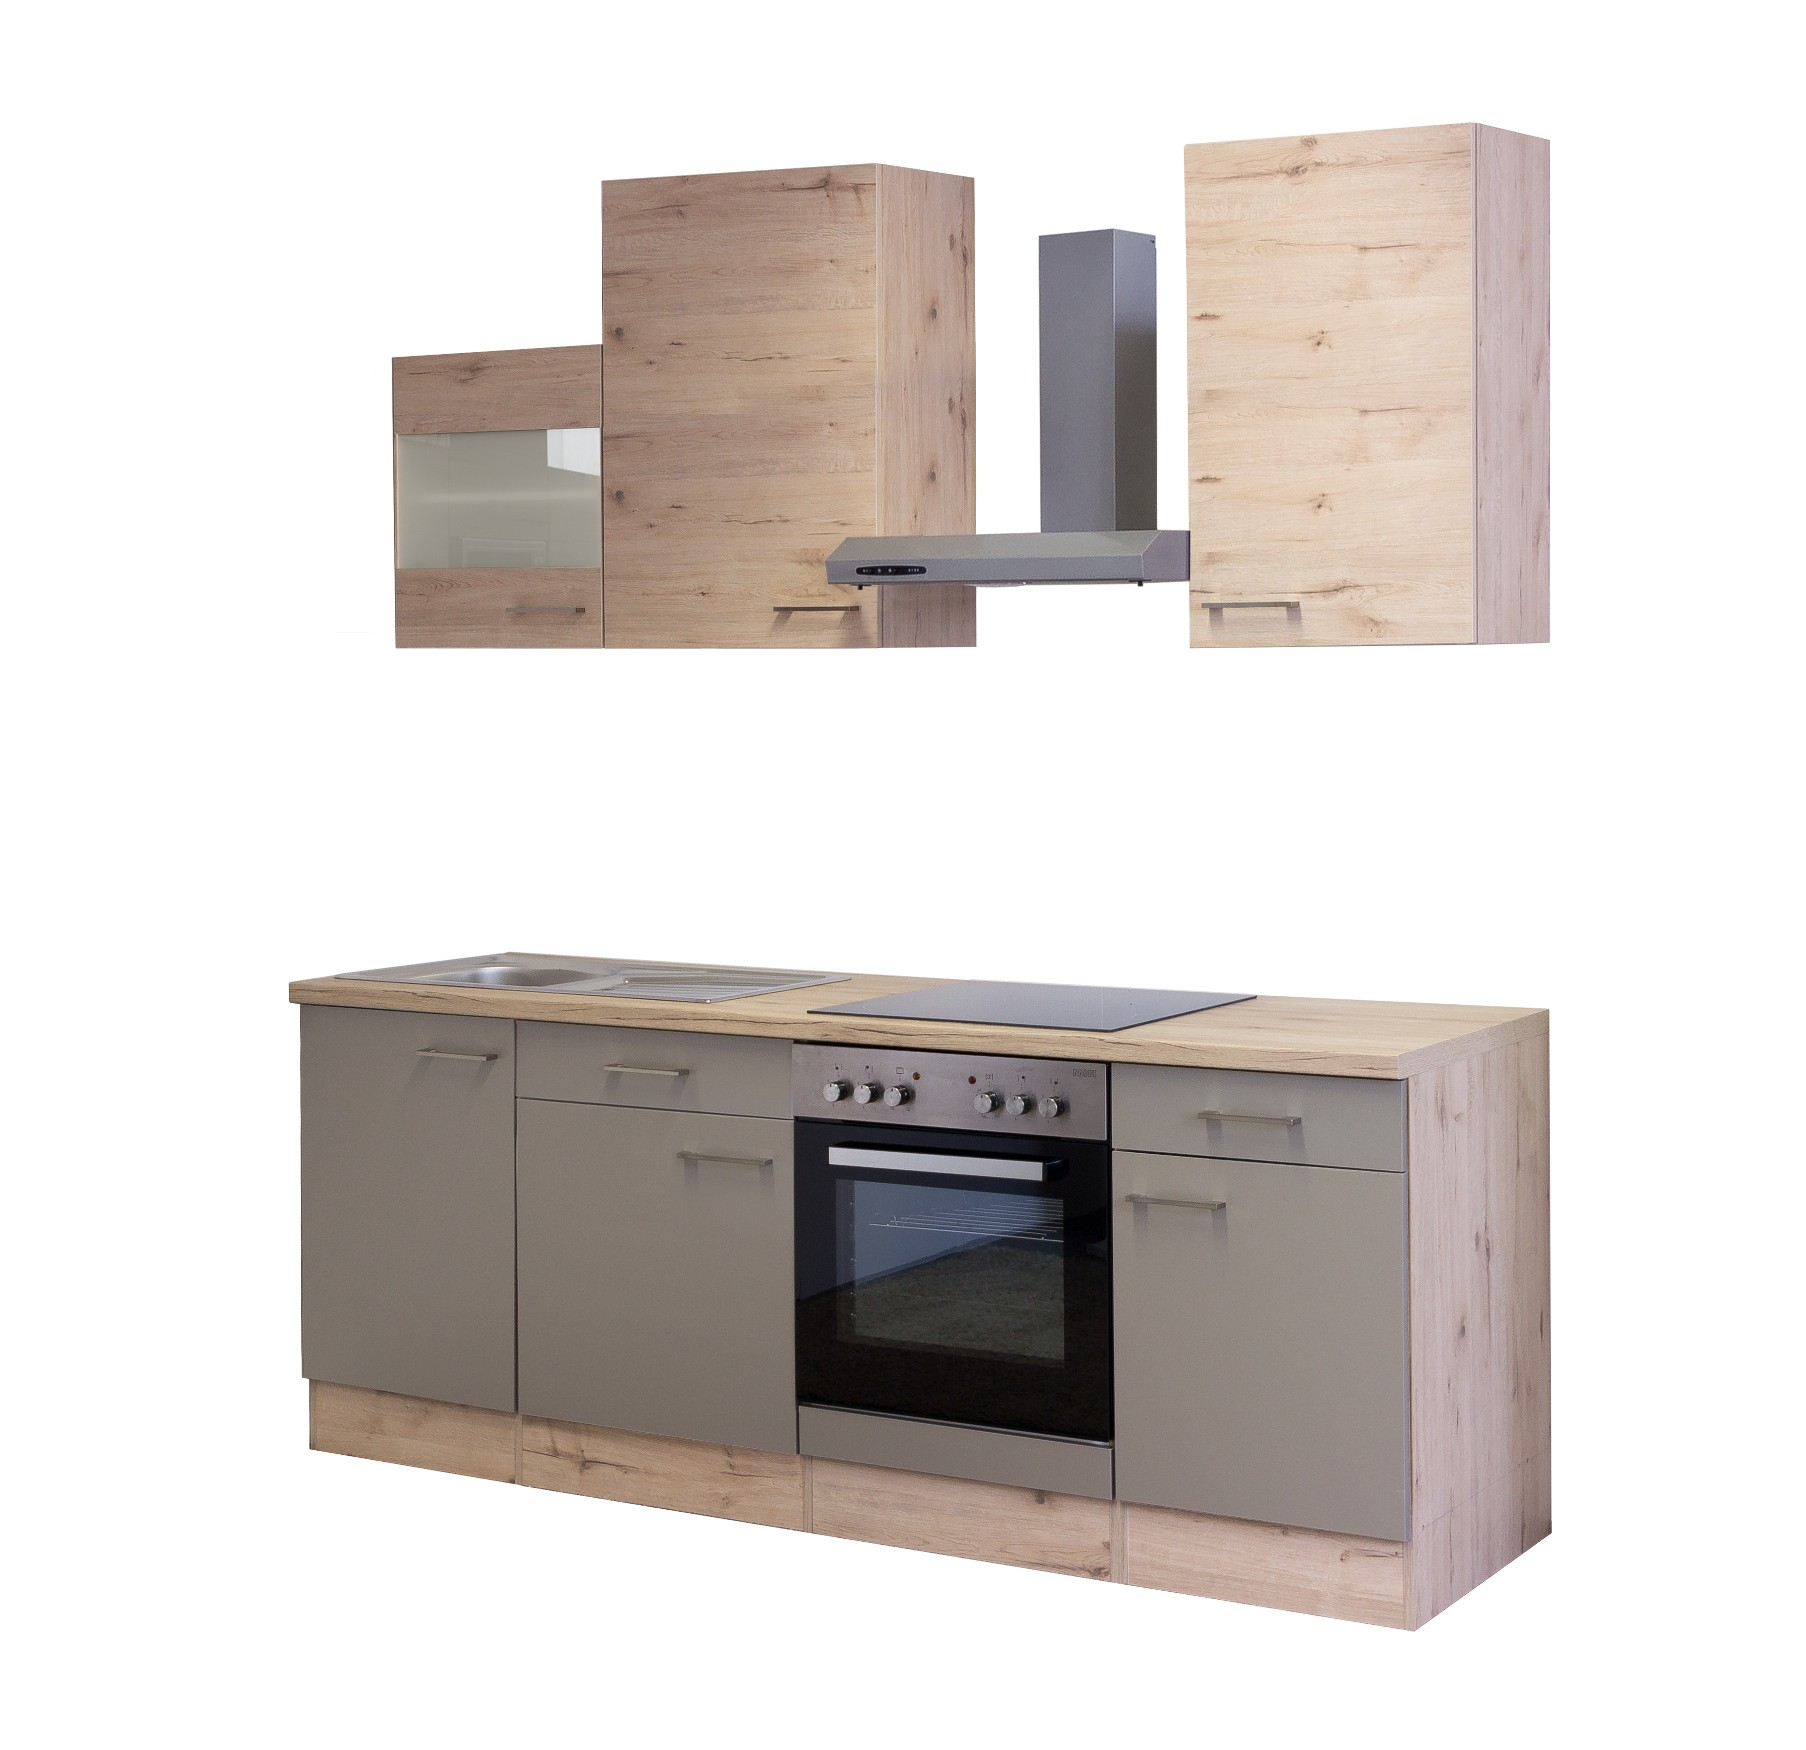 k chenblock riva k chenzeile mit e ger ten 220 cm bronze metallic ebay. Black Bedroom Furniture Sets. Home Design Ideas